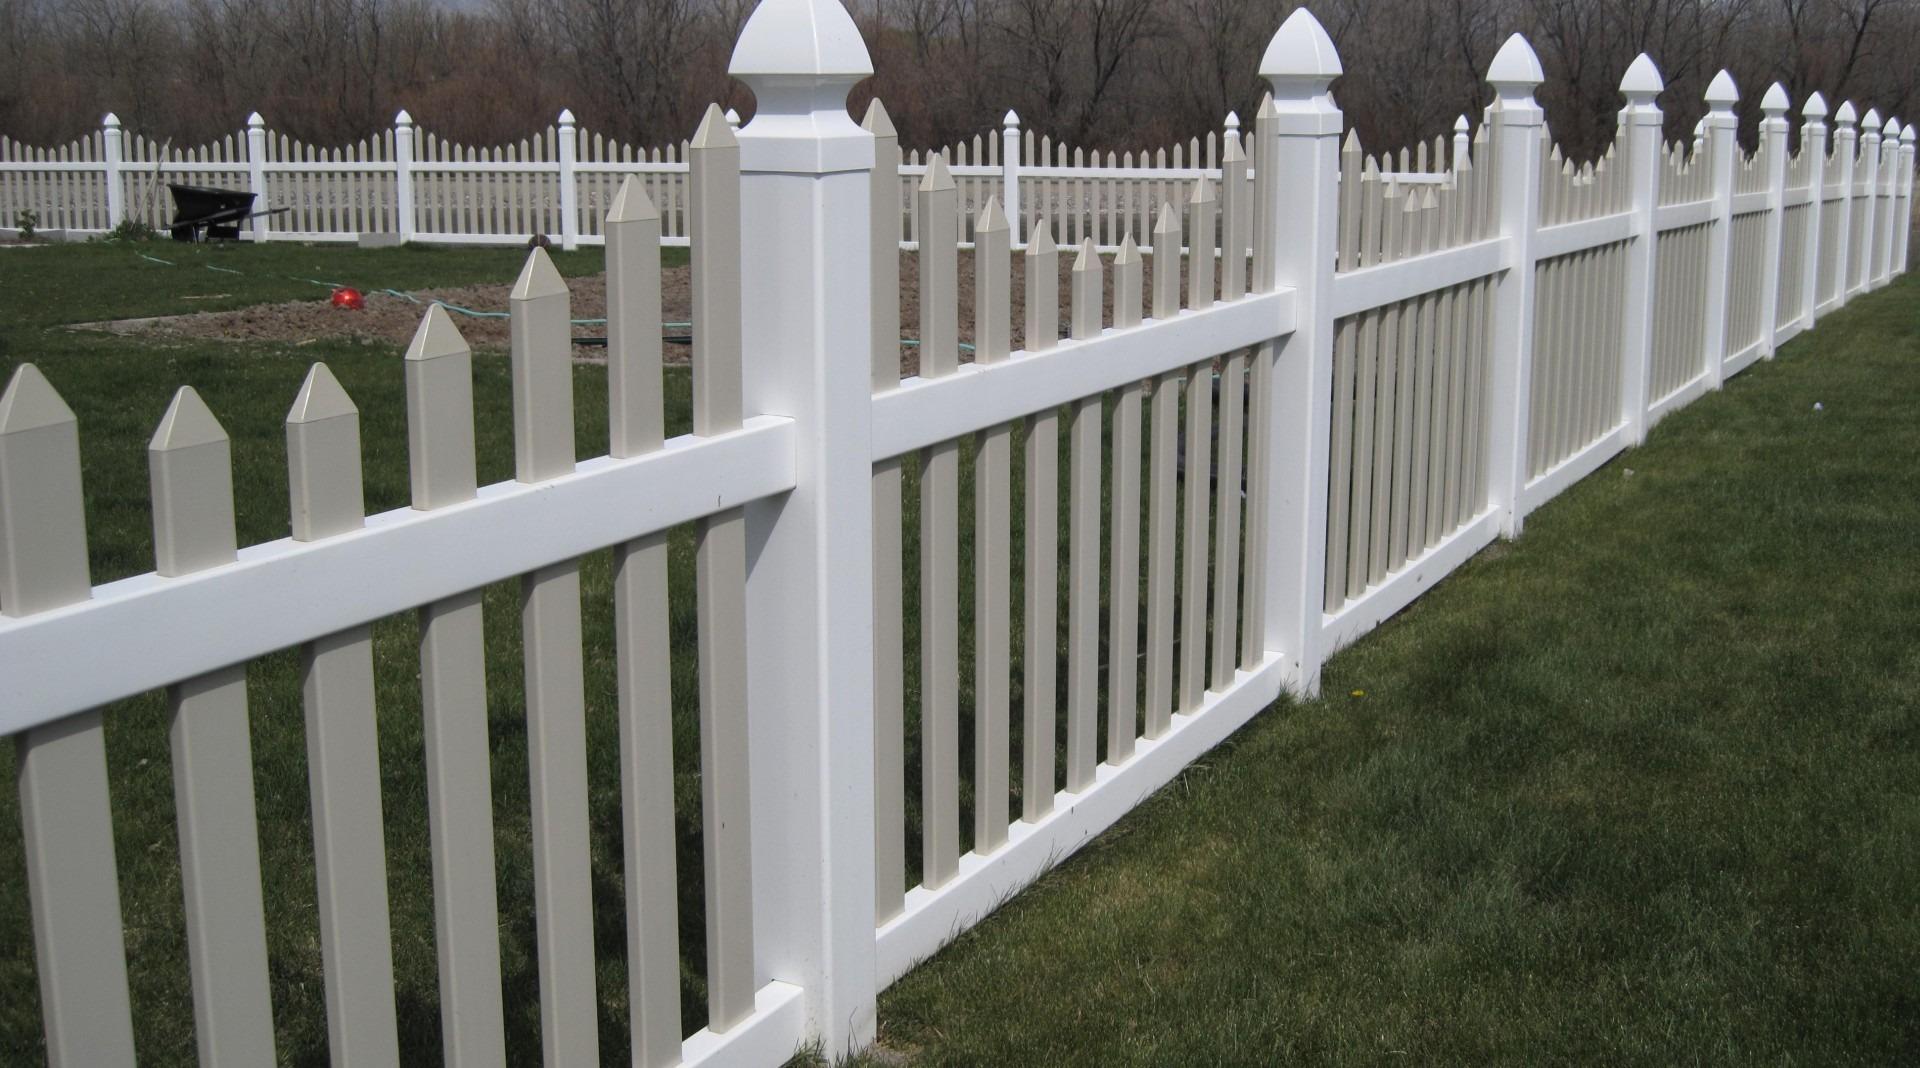 High Quality Vinyl Fences in Utah